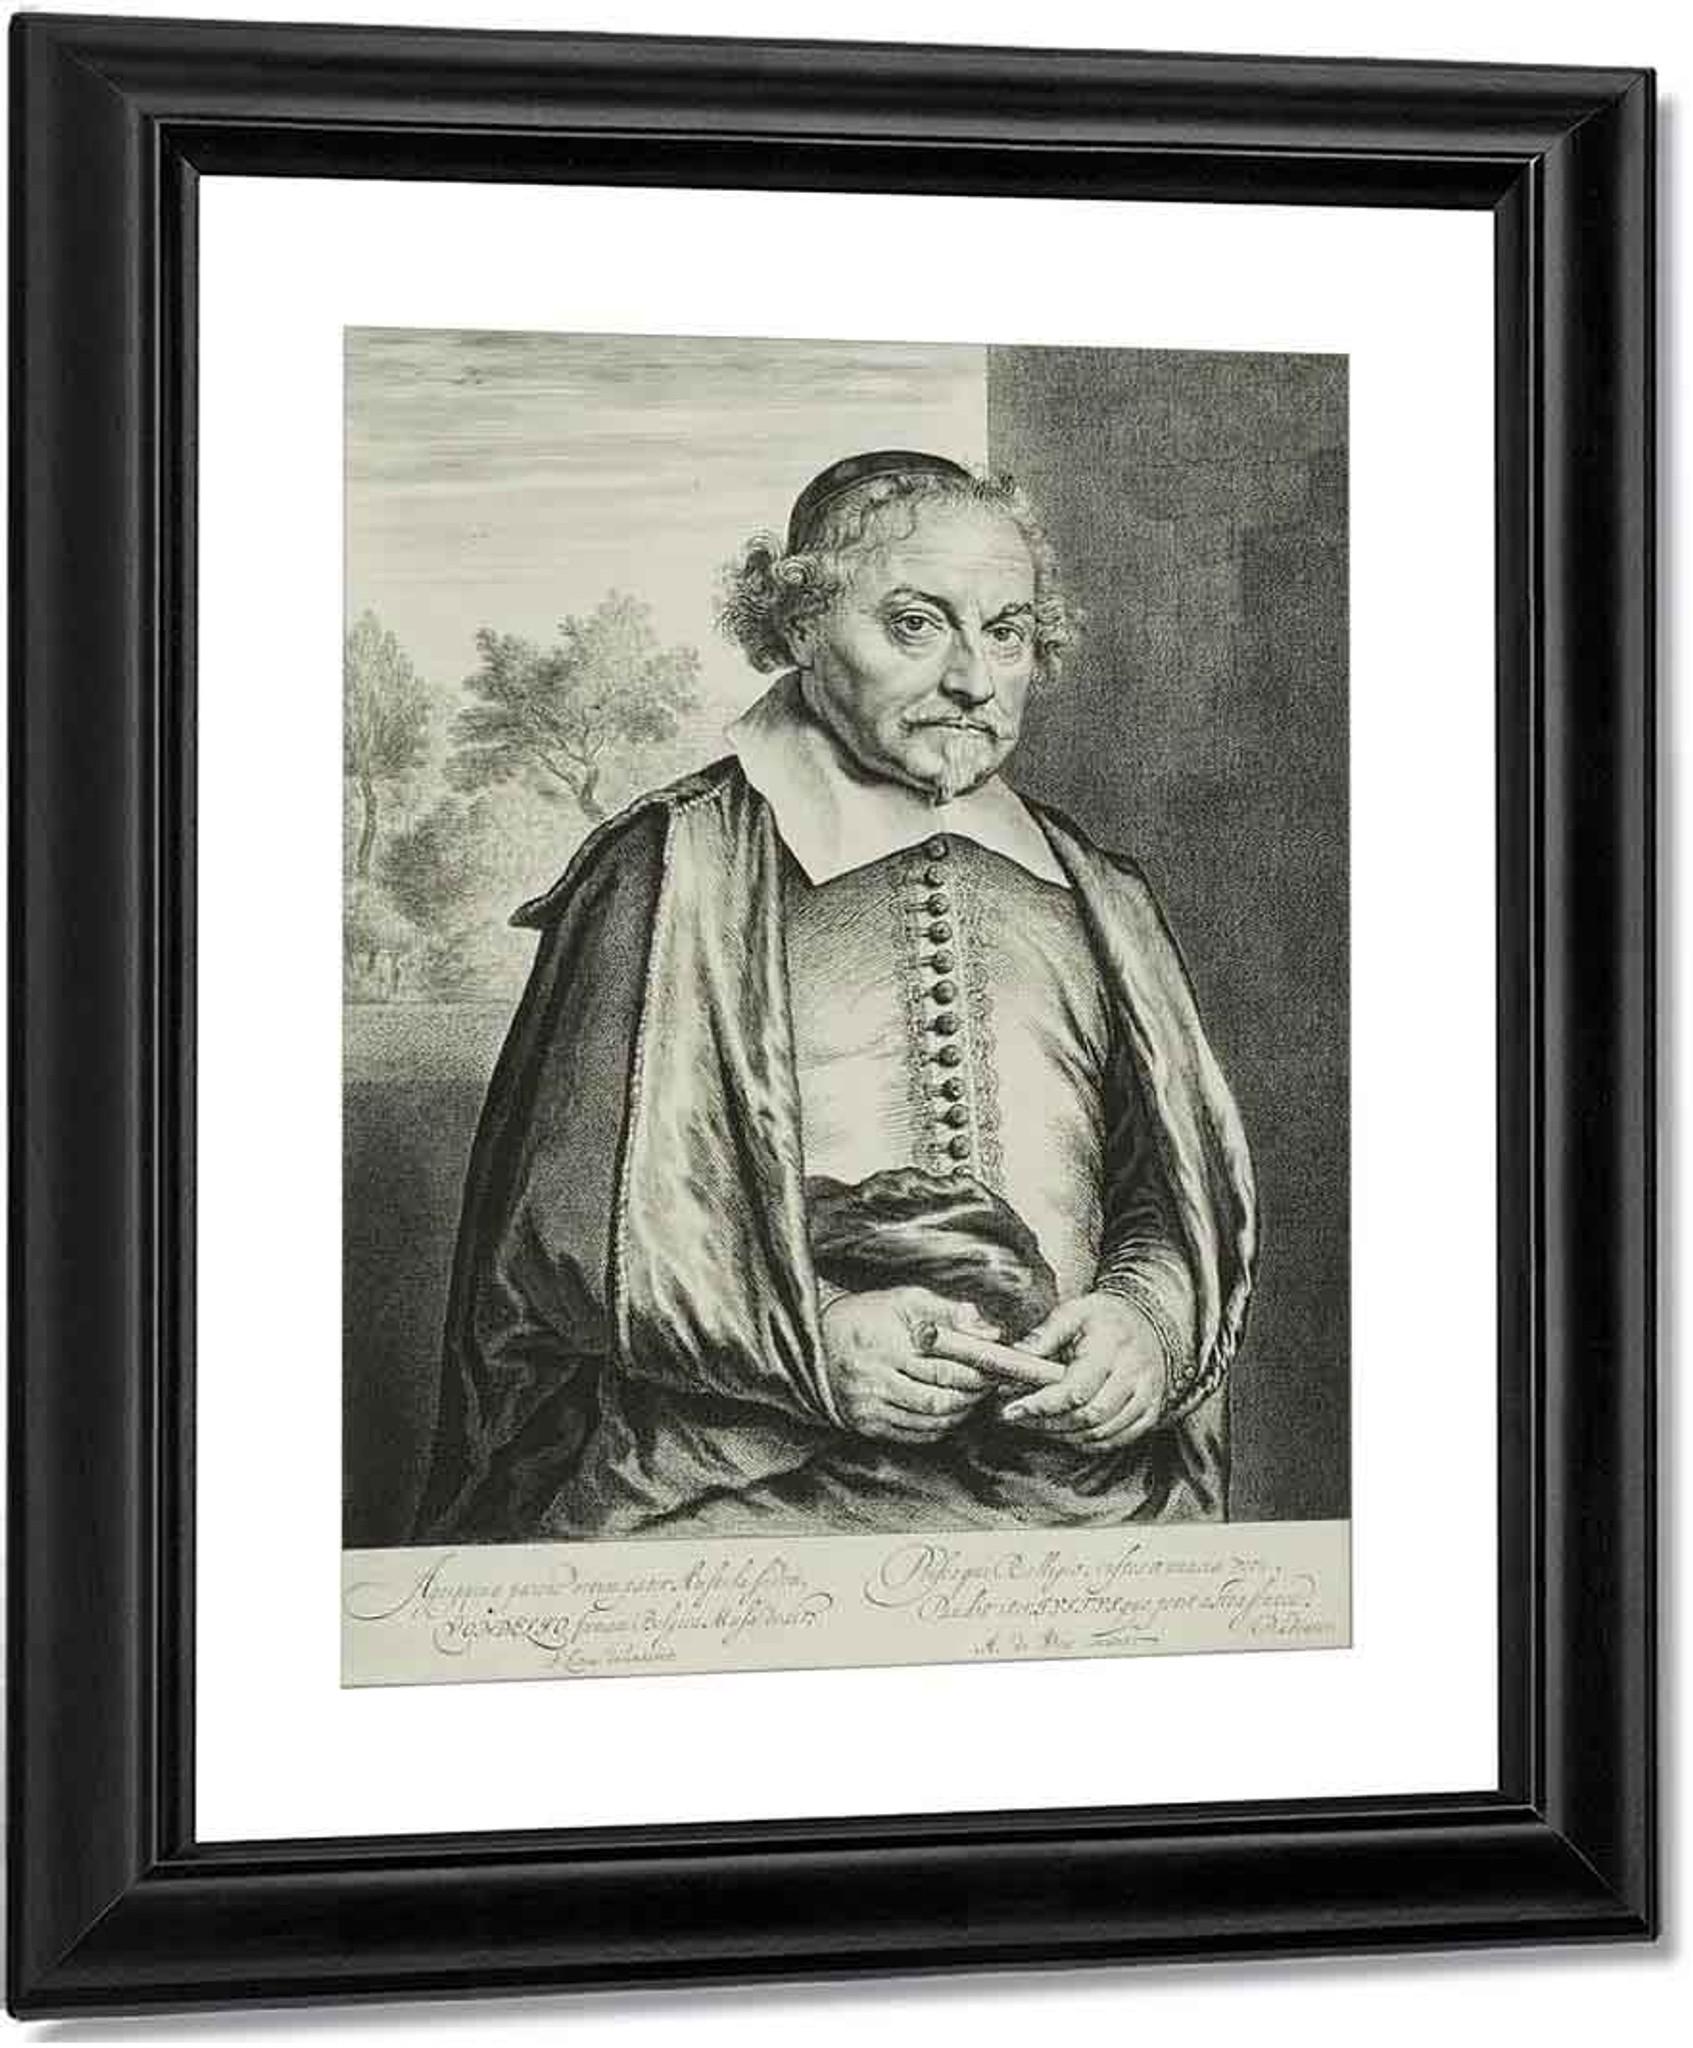 Portrait Of Joost Van Den Vondel By Jan Lievens The Elder